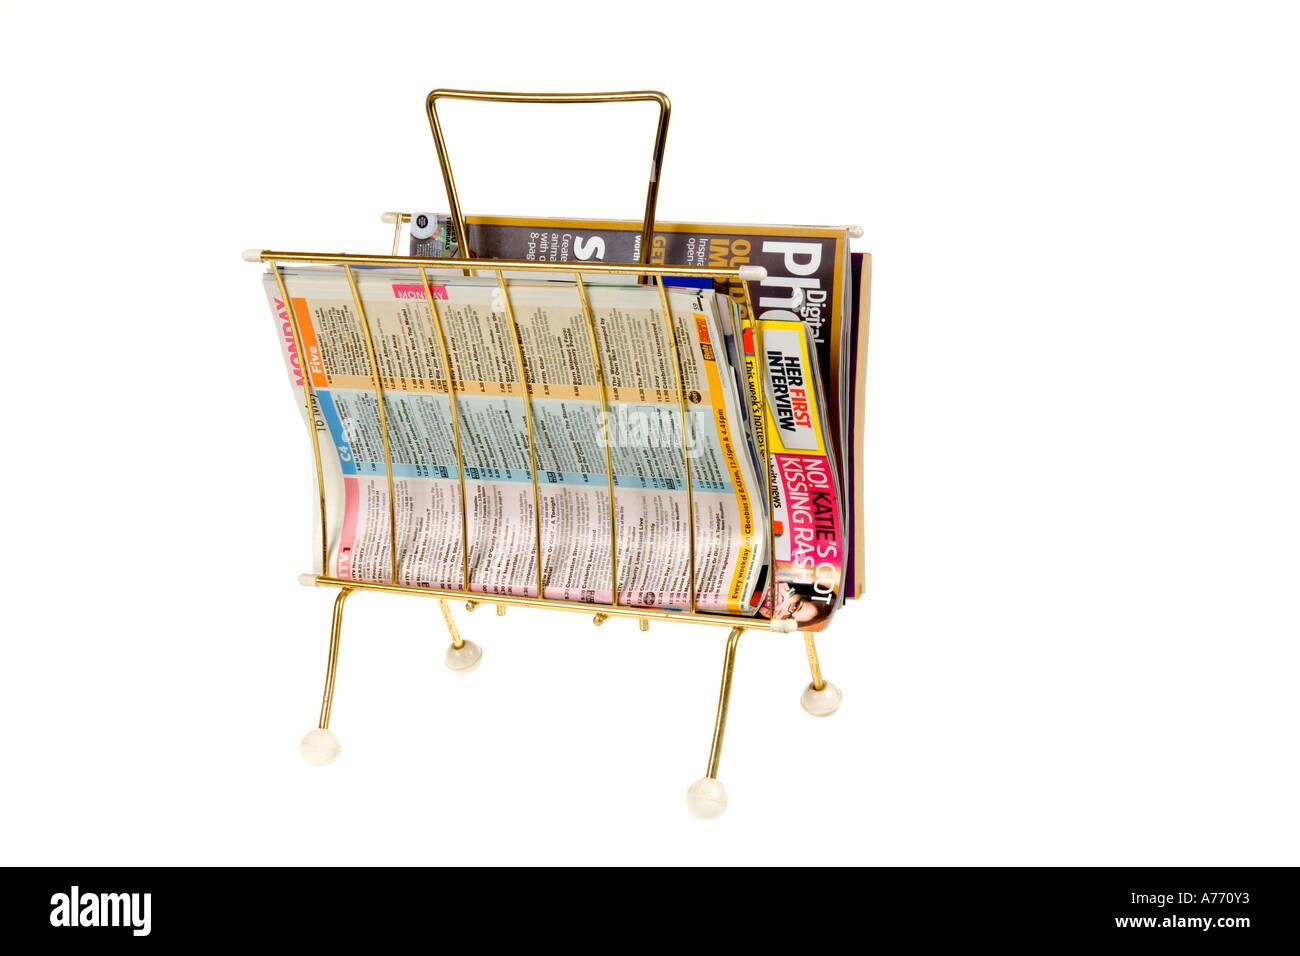 Magazine Rack Stock Photos & Magazine Rack Stock Images - Alamy